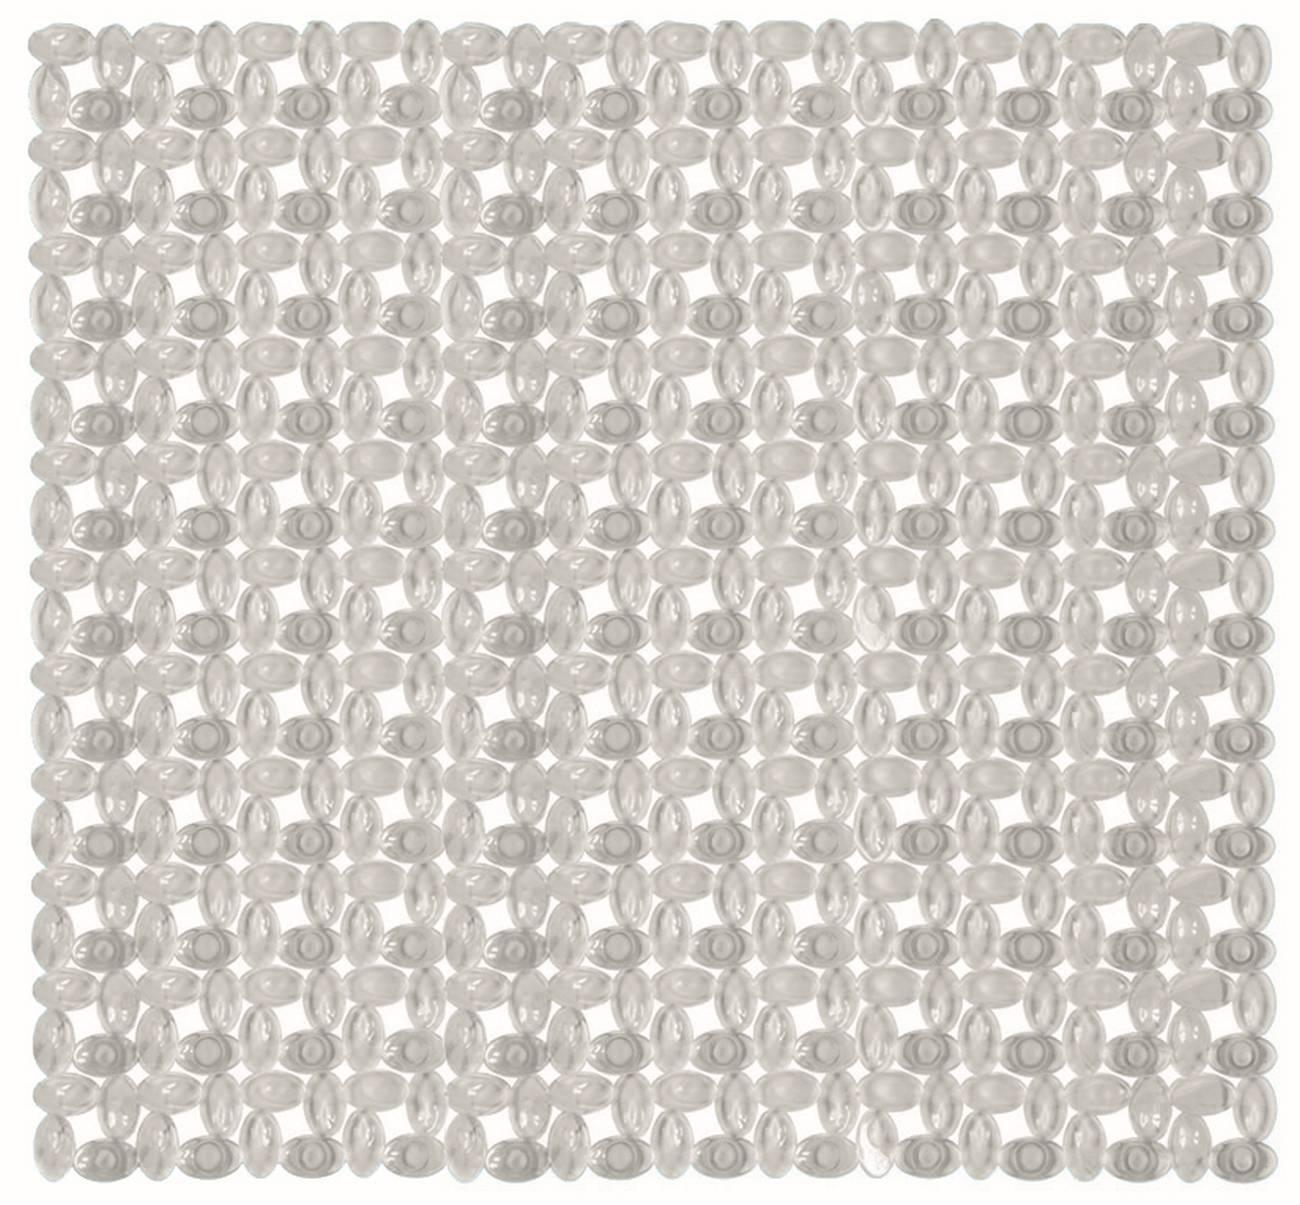 Wanneneinlage Ivy PVC Clear 39x 69 cm